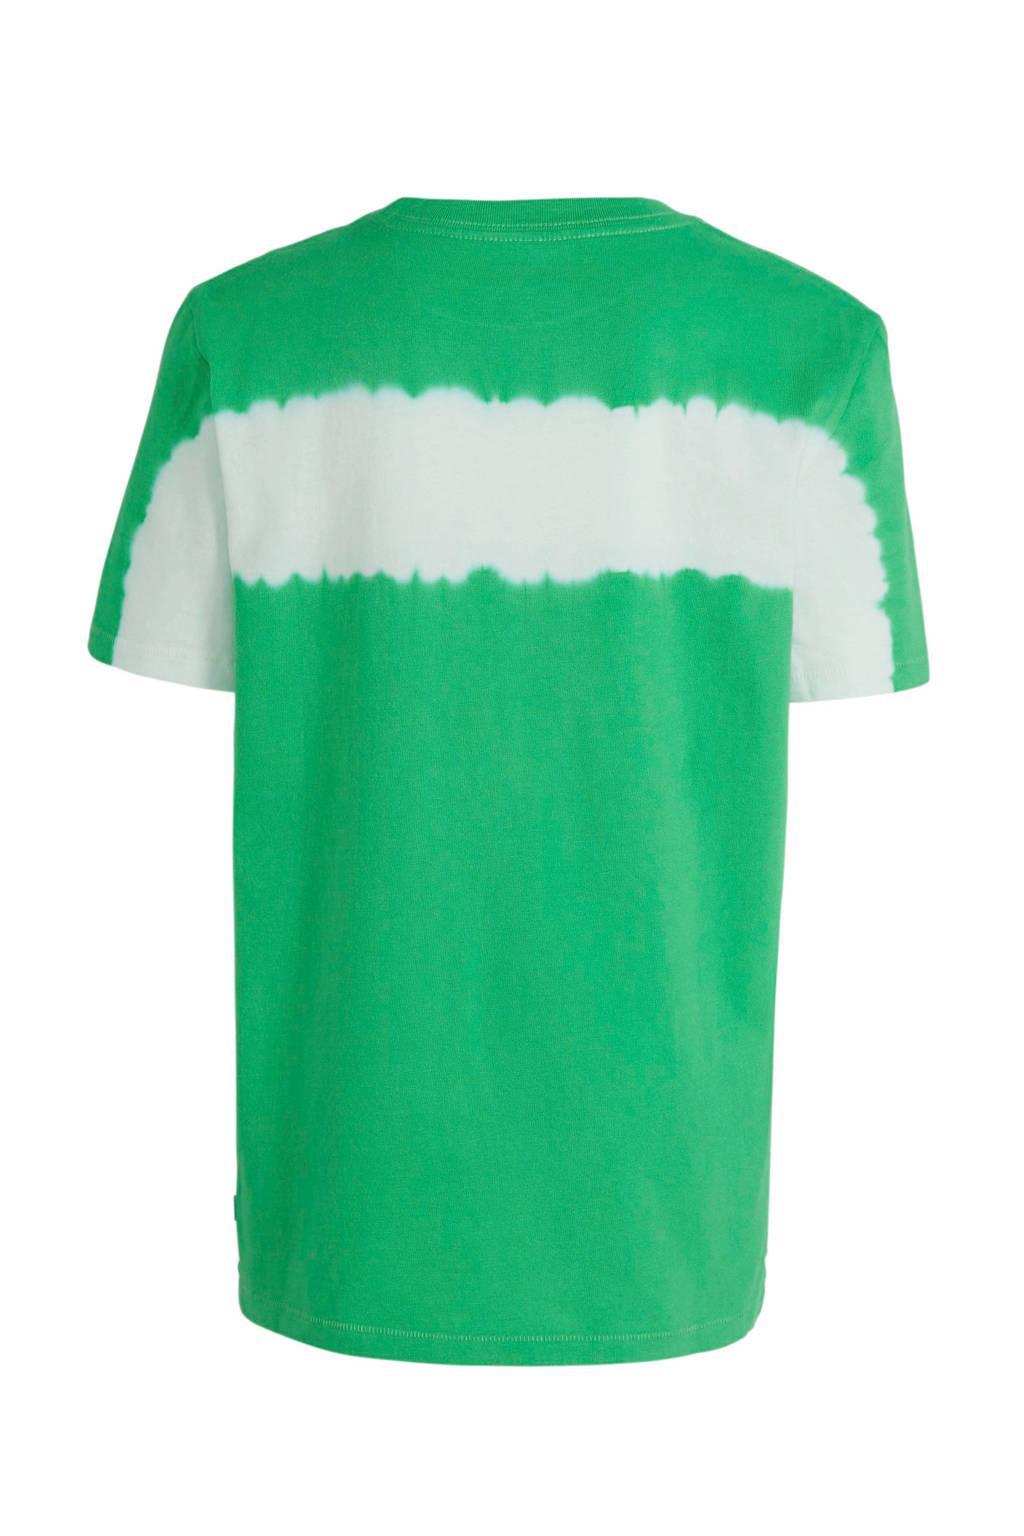 GAP T-shirt groen/wit, Groen/wit